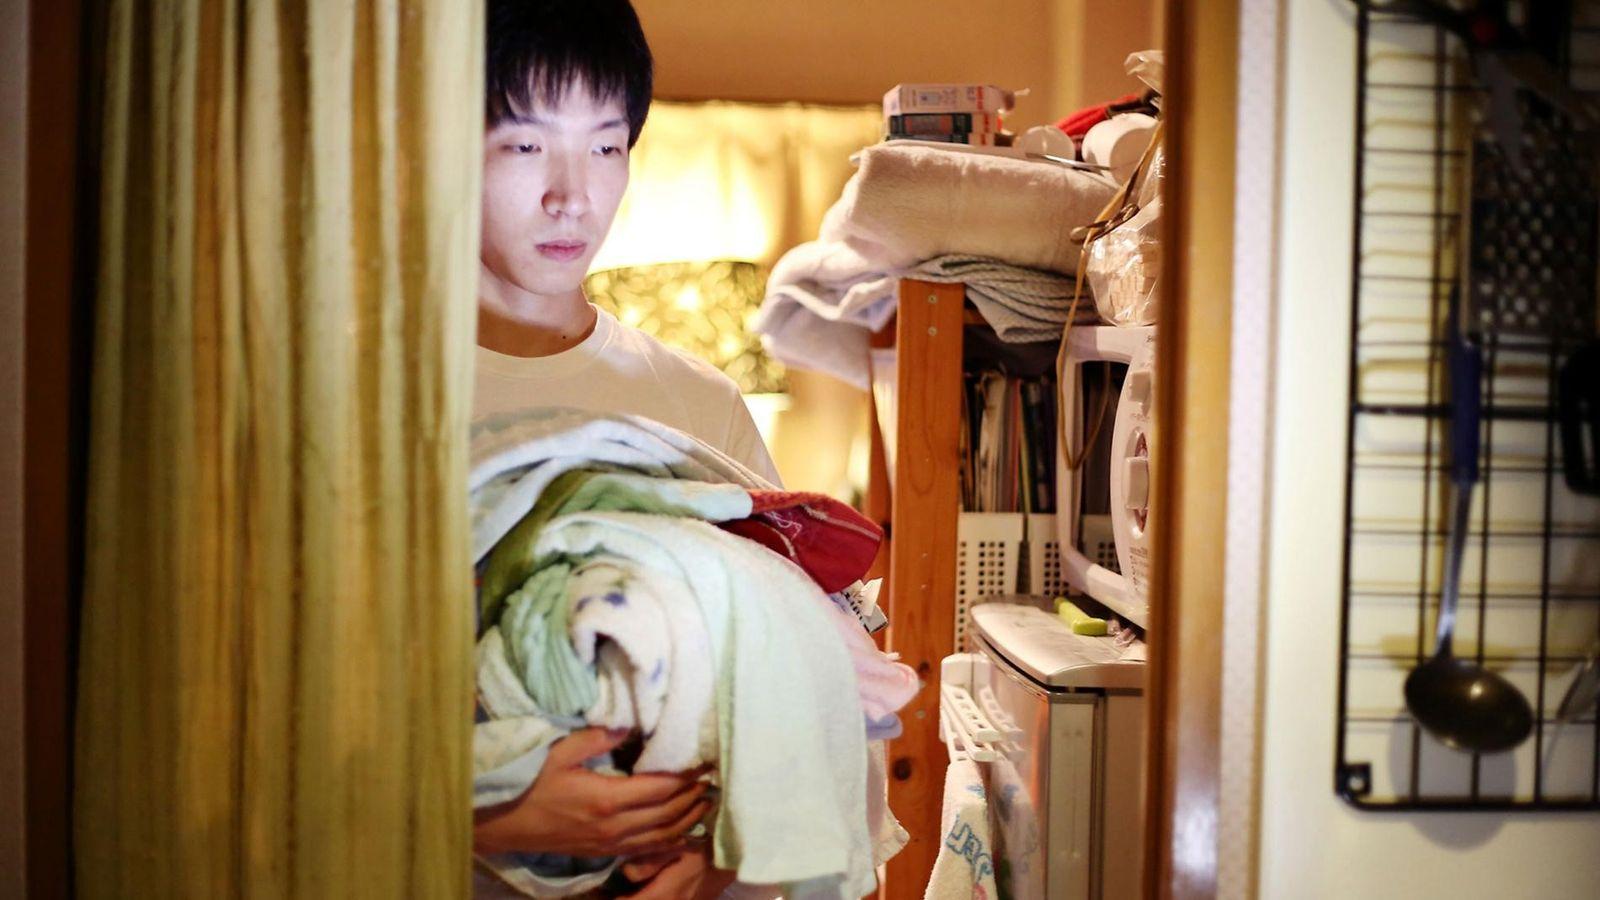 Fuminori Akoa, 29 ans, vit dans sa chambre depuis un an. La photographe Maika Elan lui ...